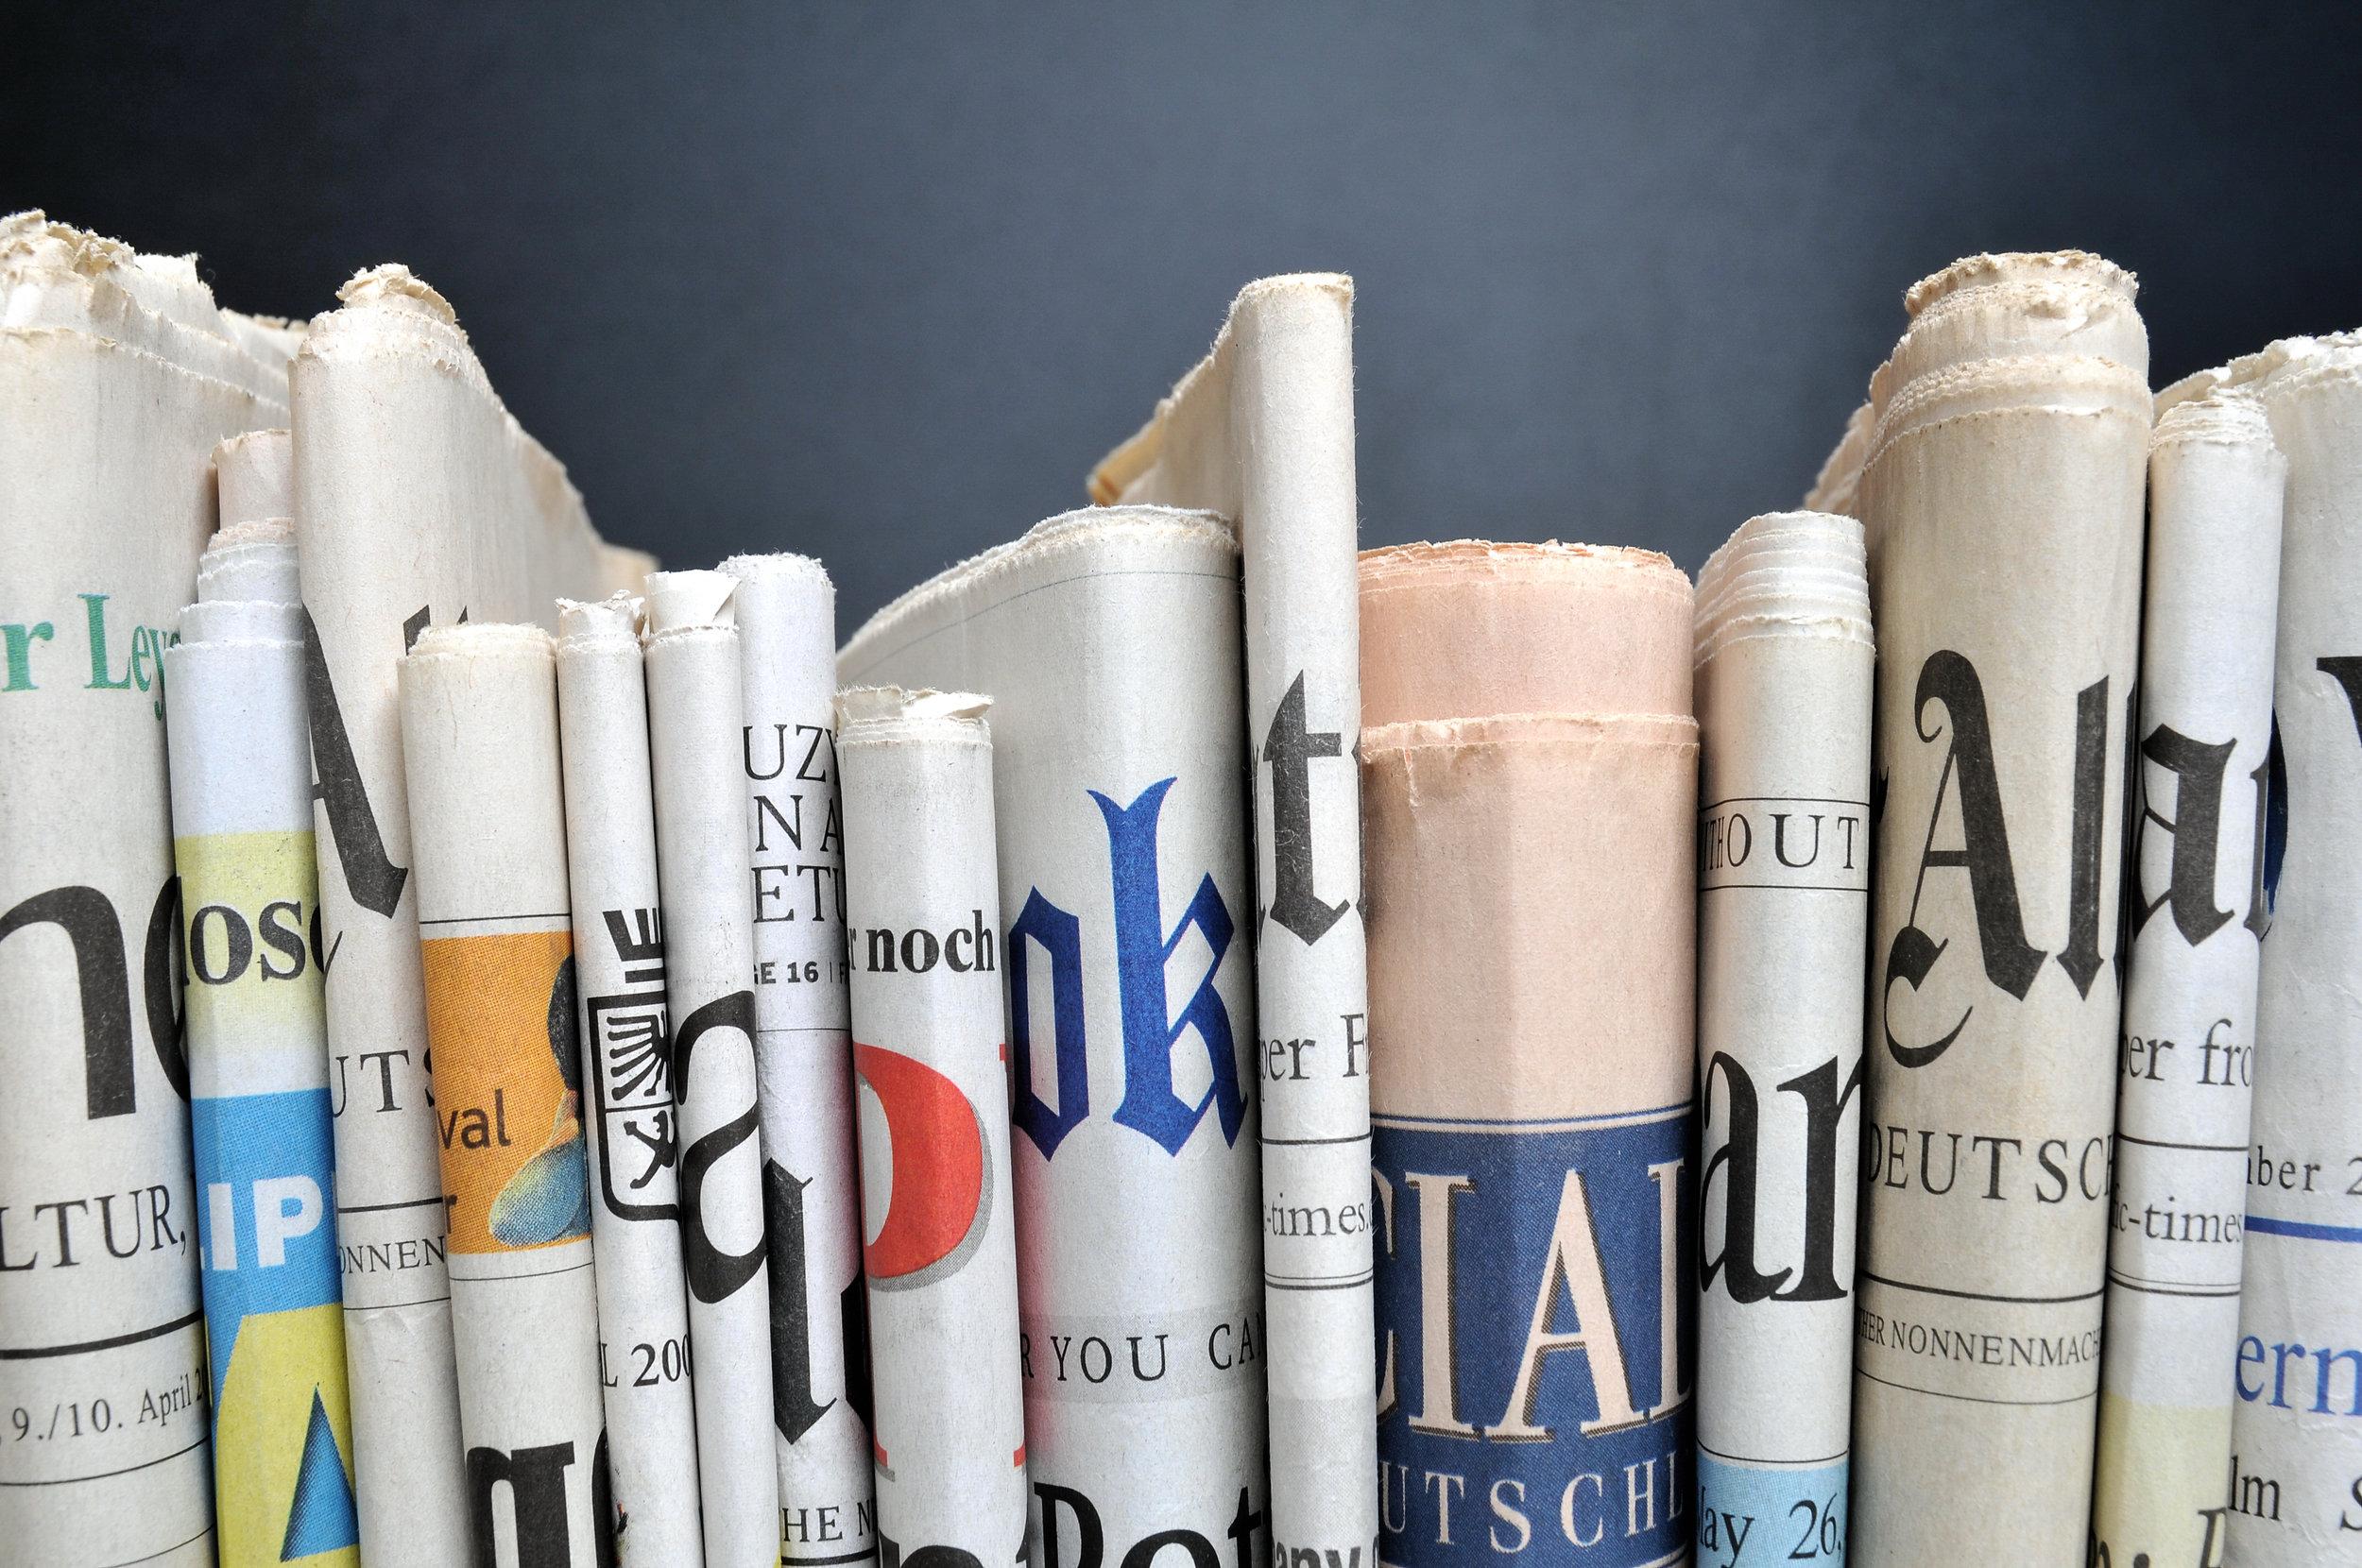 ARTICLES / NEWS -